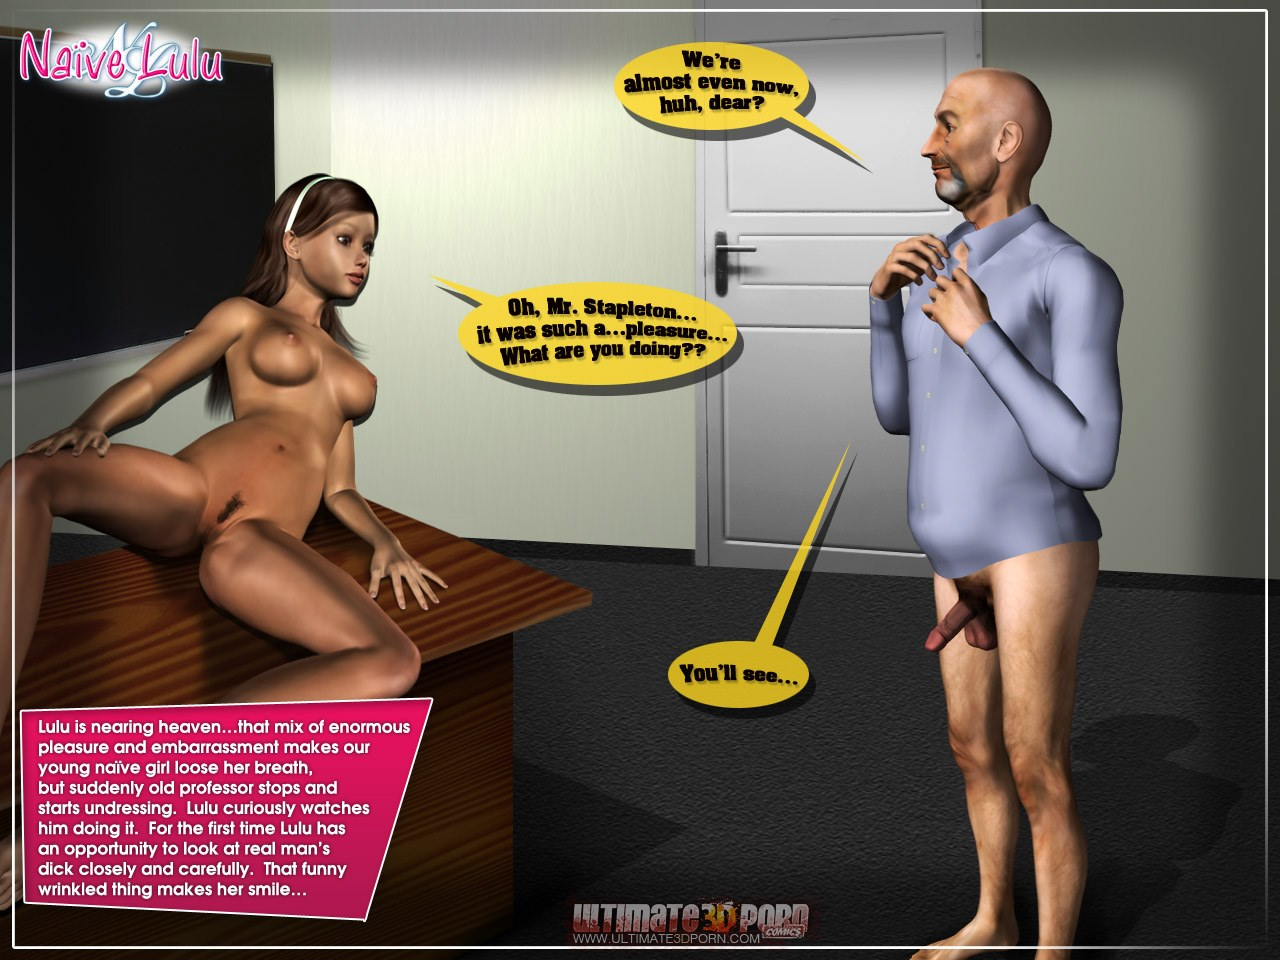 Naive Lulu 1- Ultimate 3D Porn - part 3